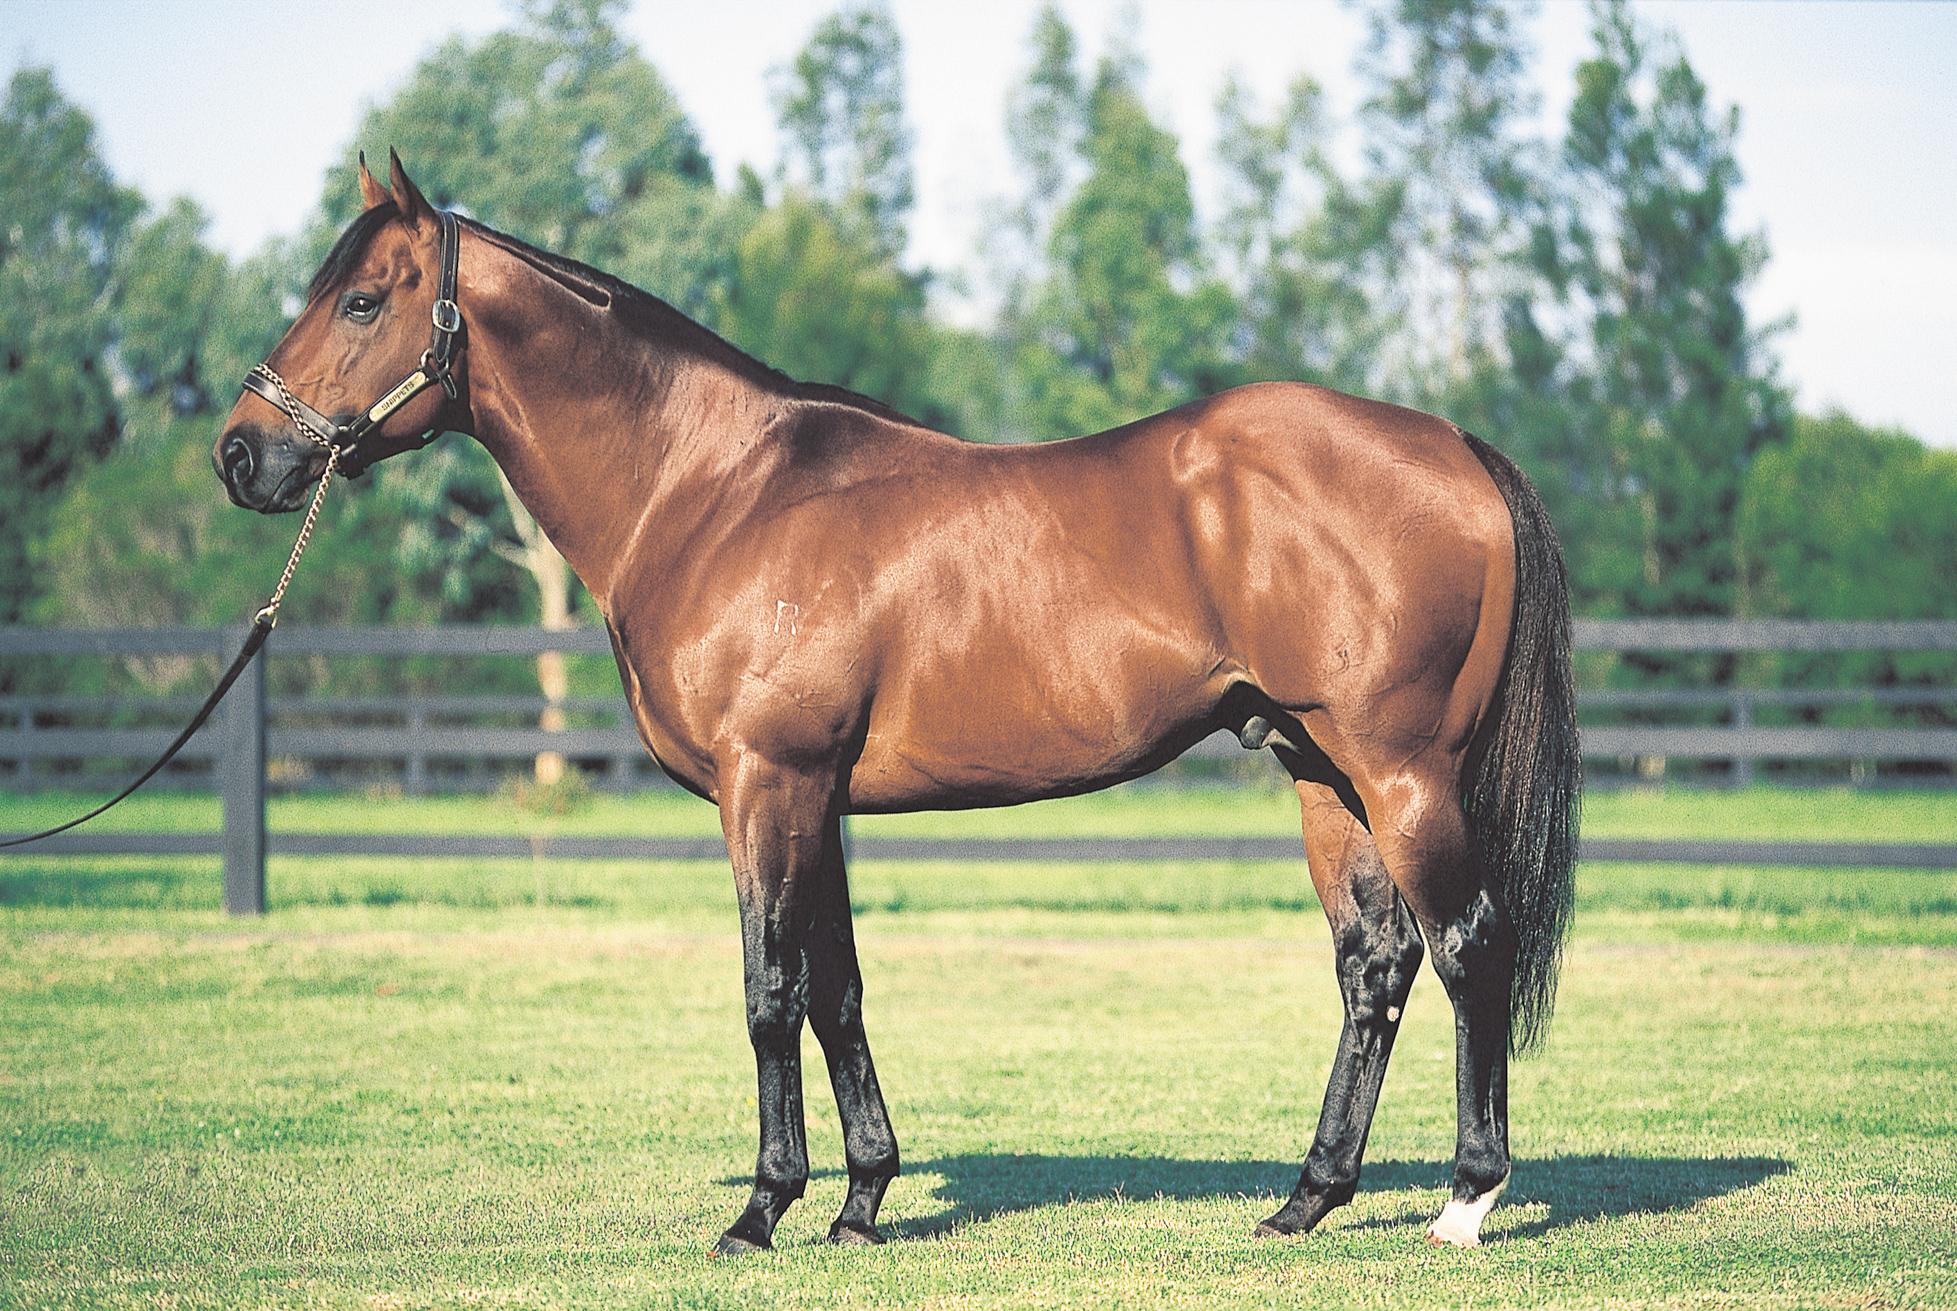 https://www.stallions.com.au/wp-content/uploads/2020/08/Snippets-S2000.jpg